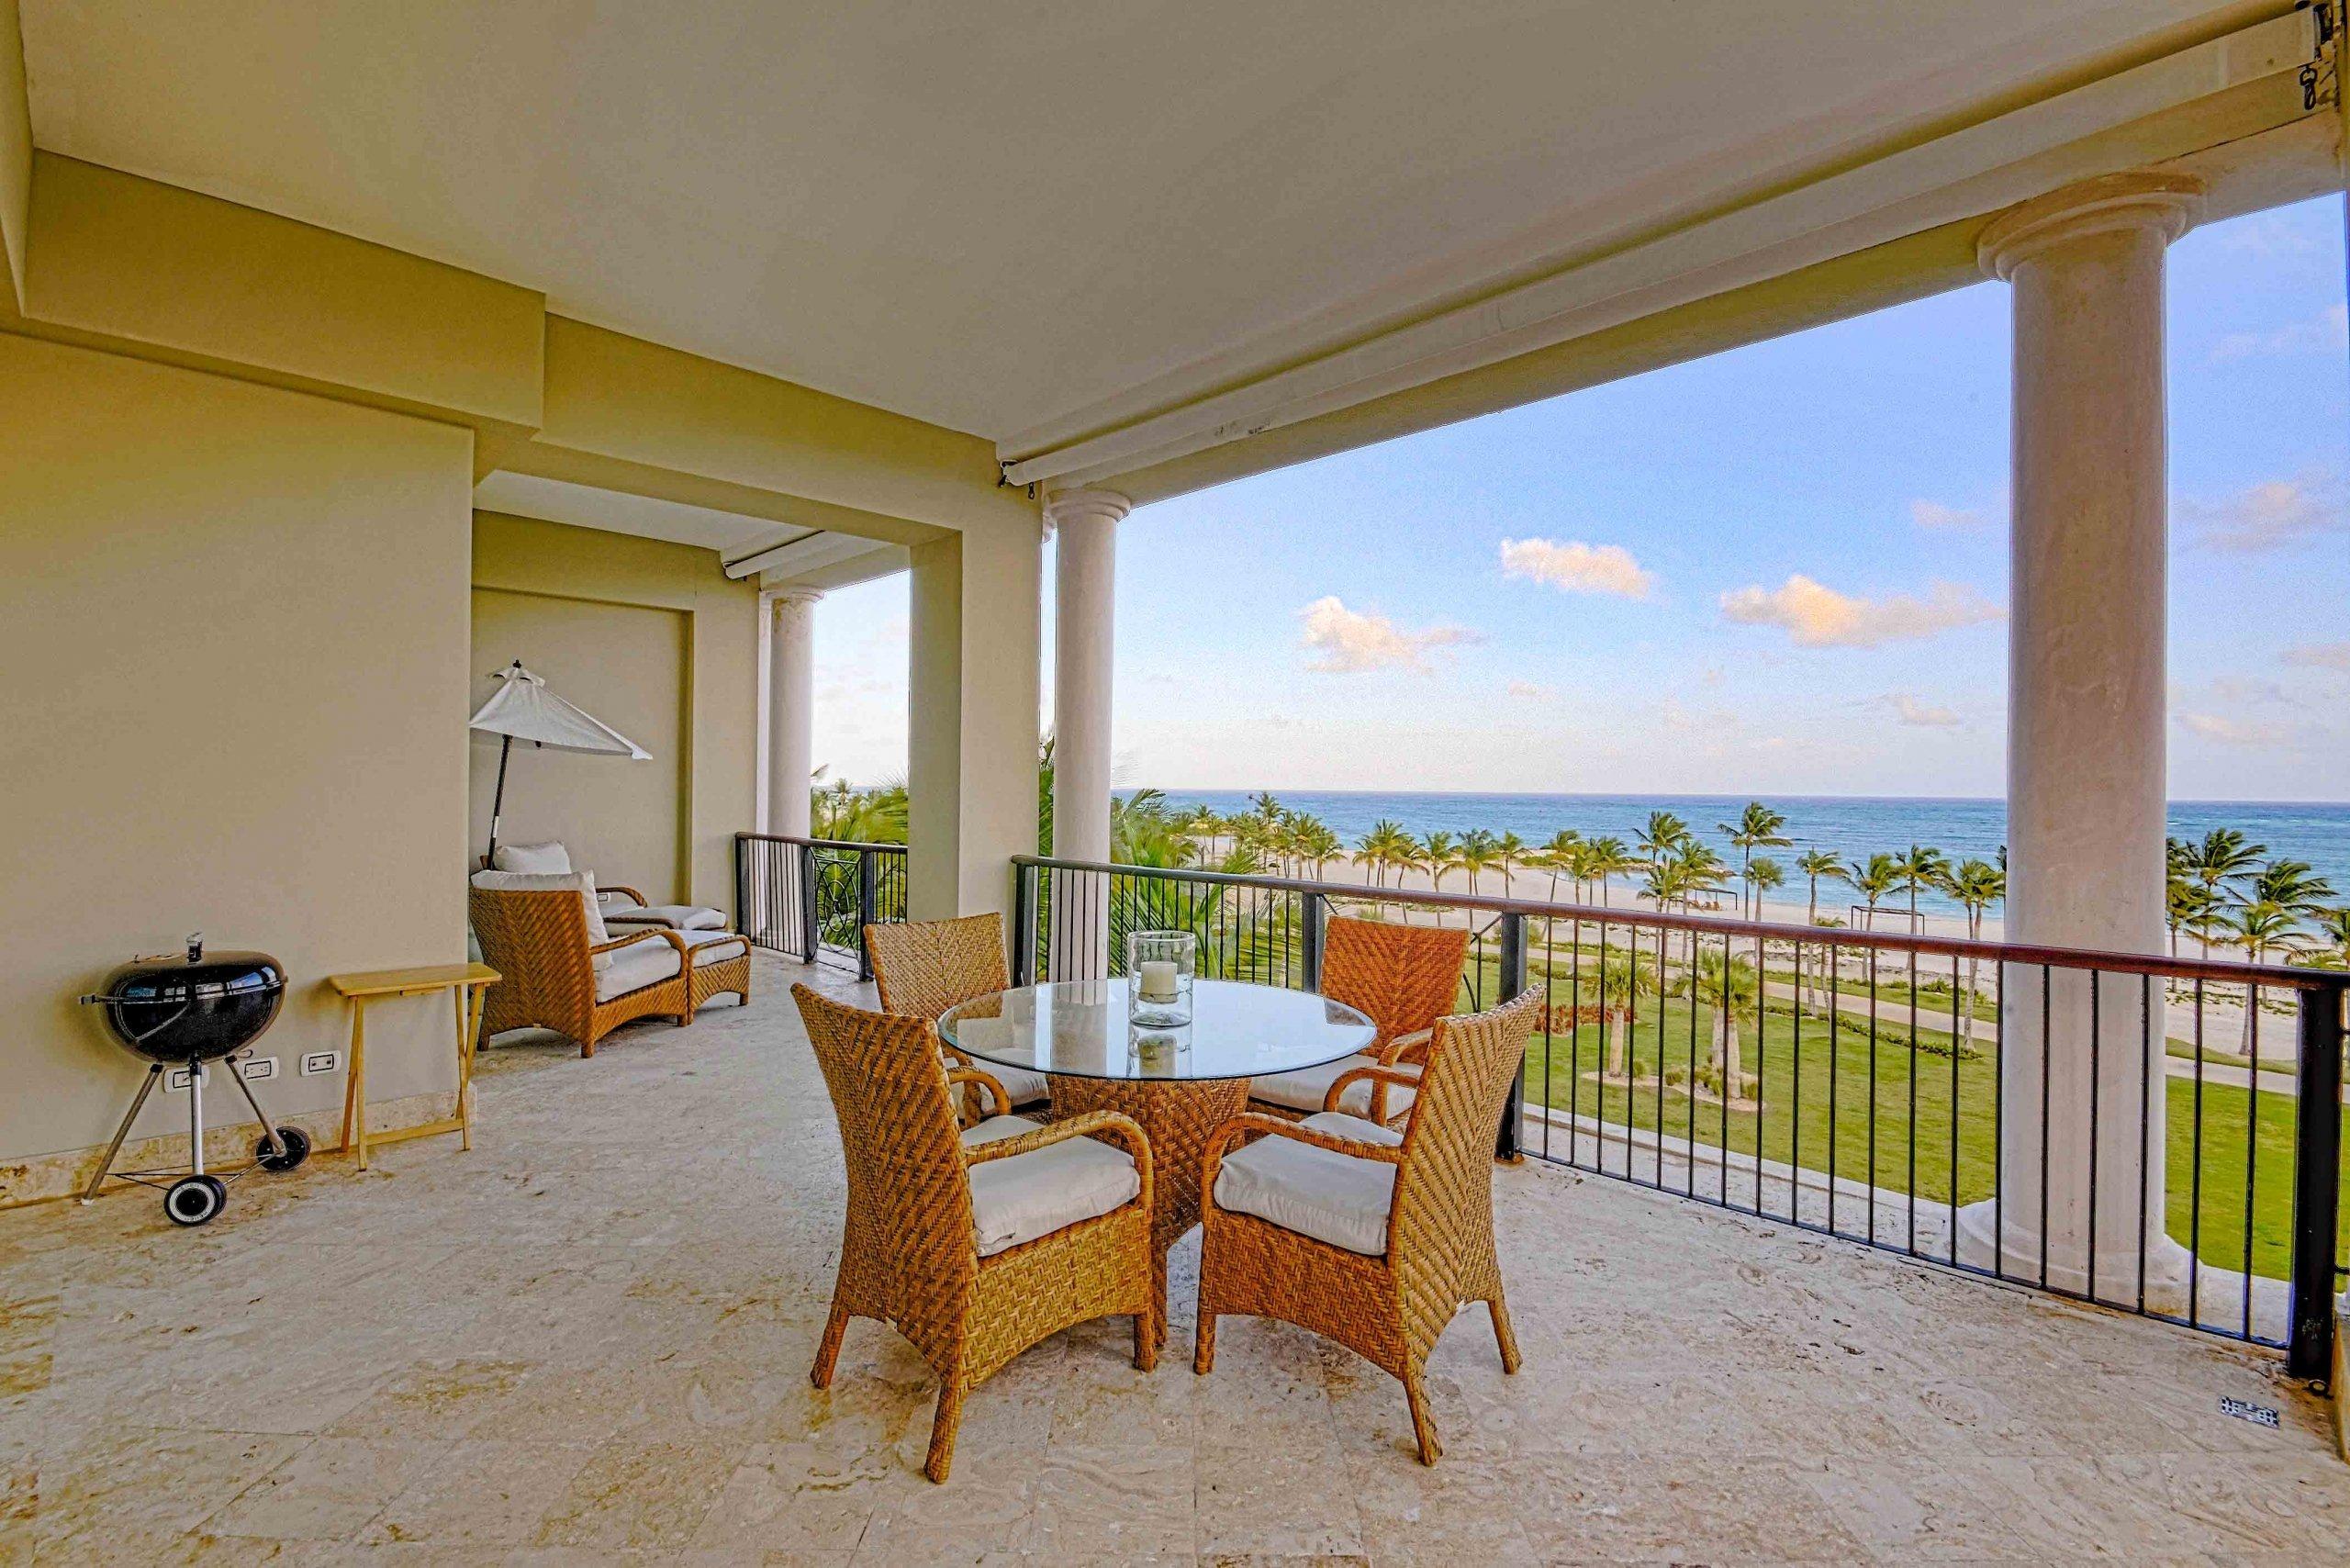 Bienes Raíces Cap Cana punta cana venta apartamentos condominios condo vista marina playa golf epic real estate república dominicana Aquamarina beach